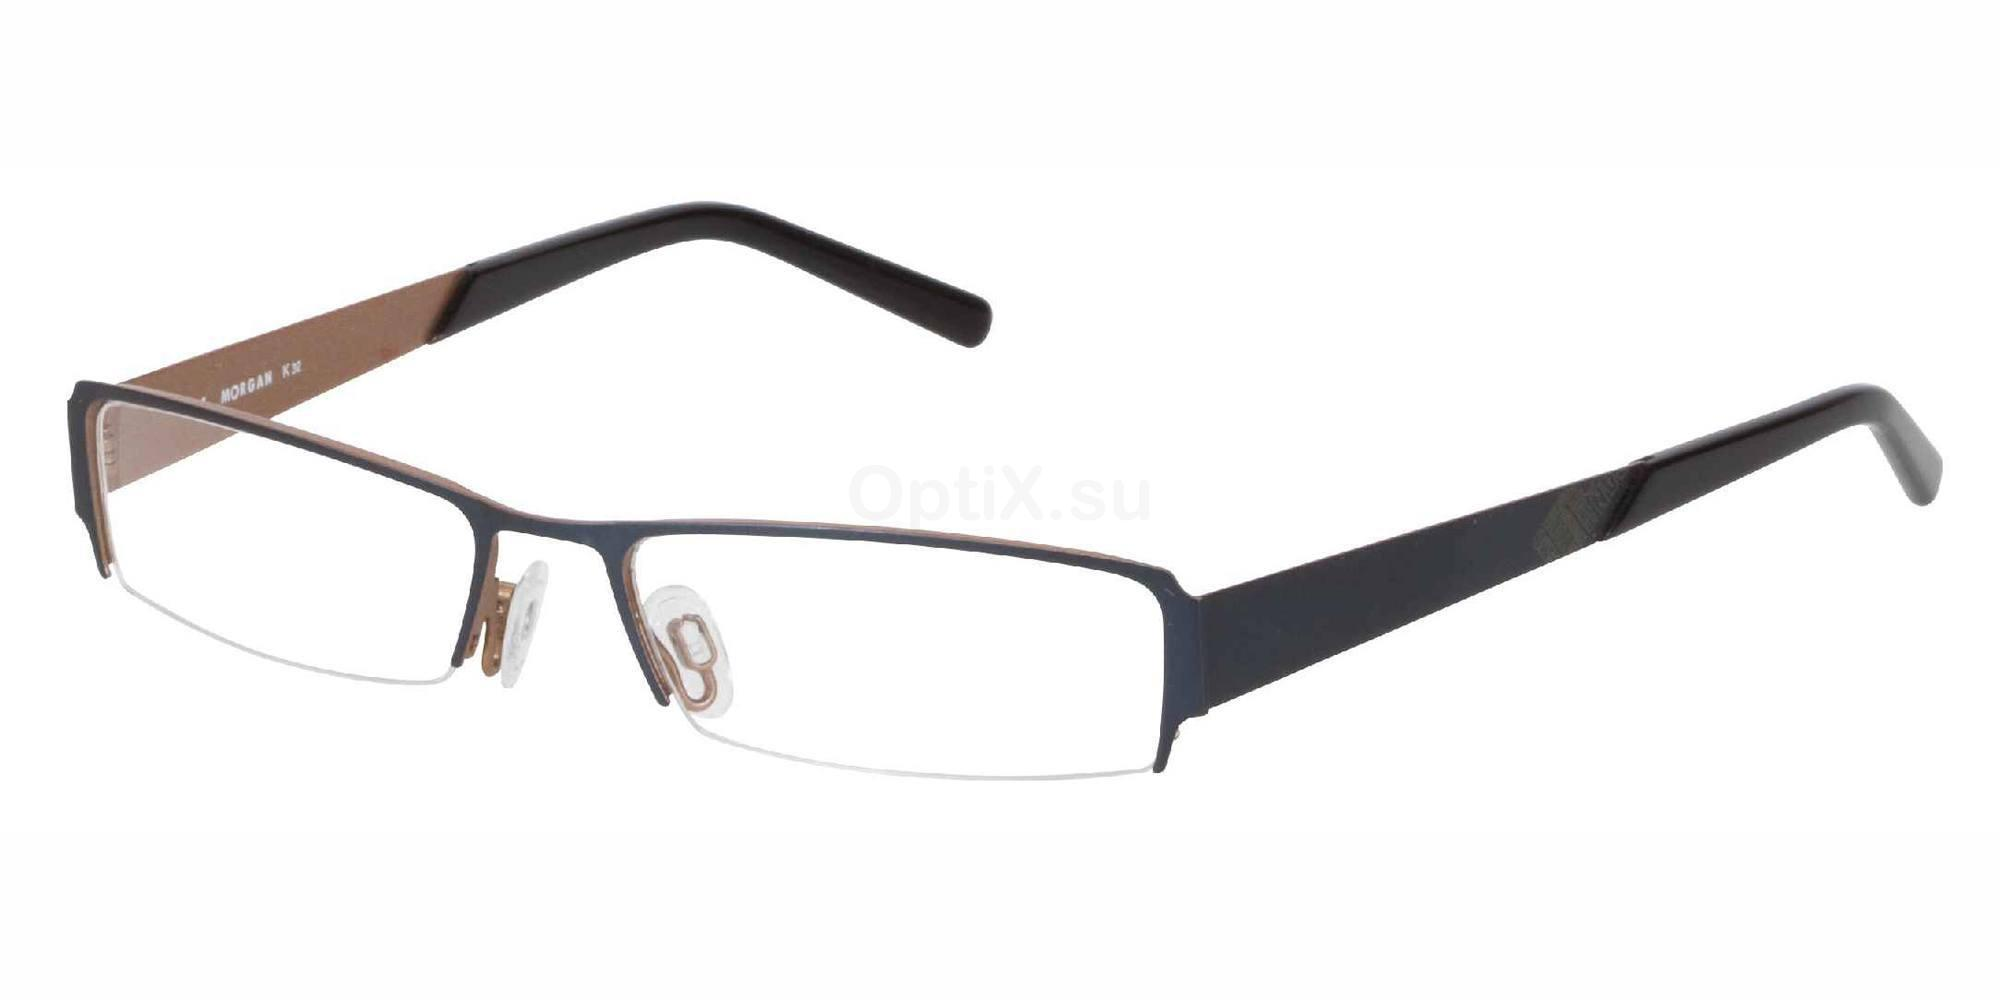 375 203103 , MORGAN Eyewear